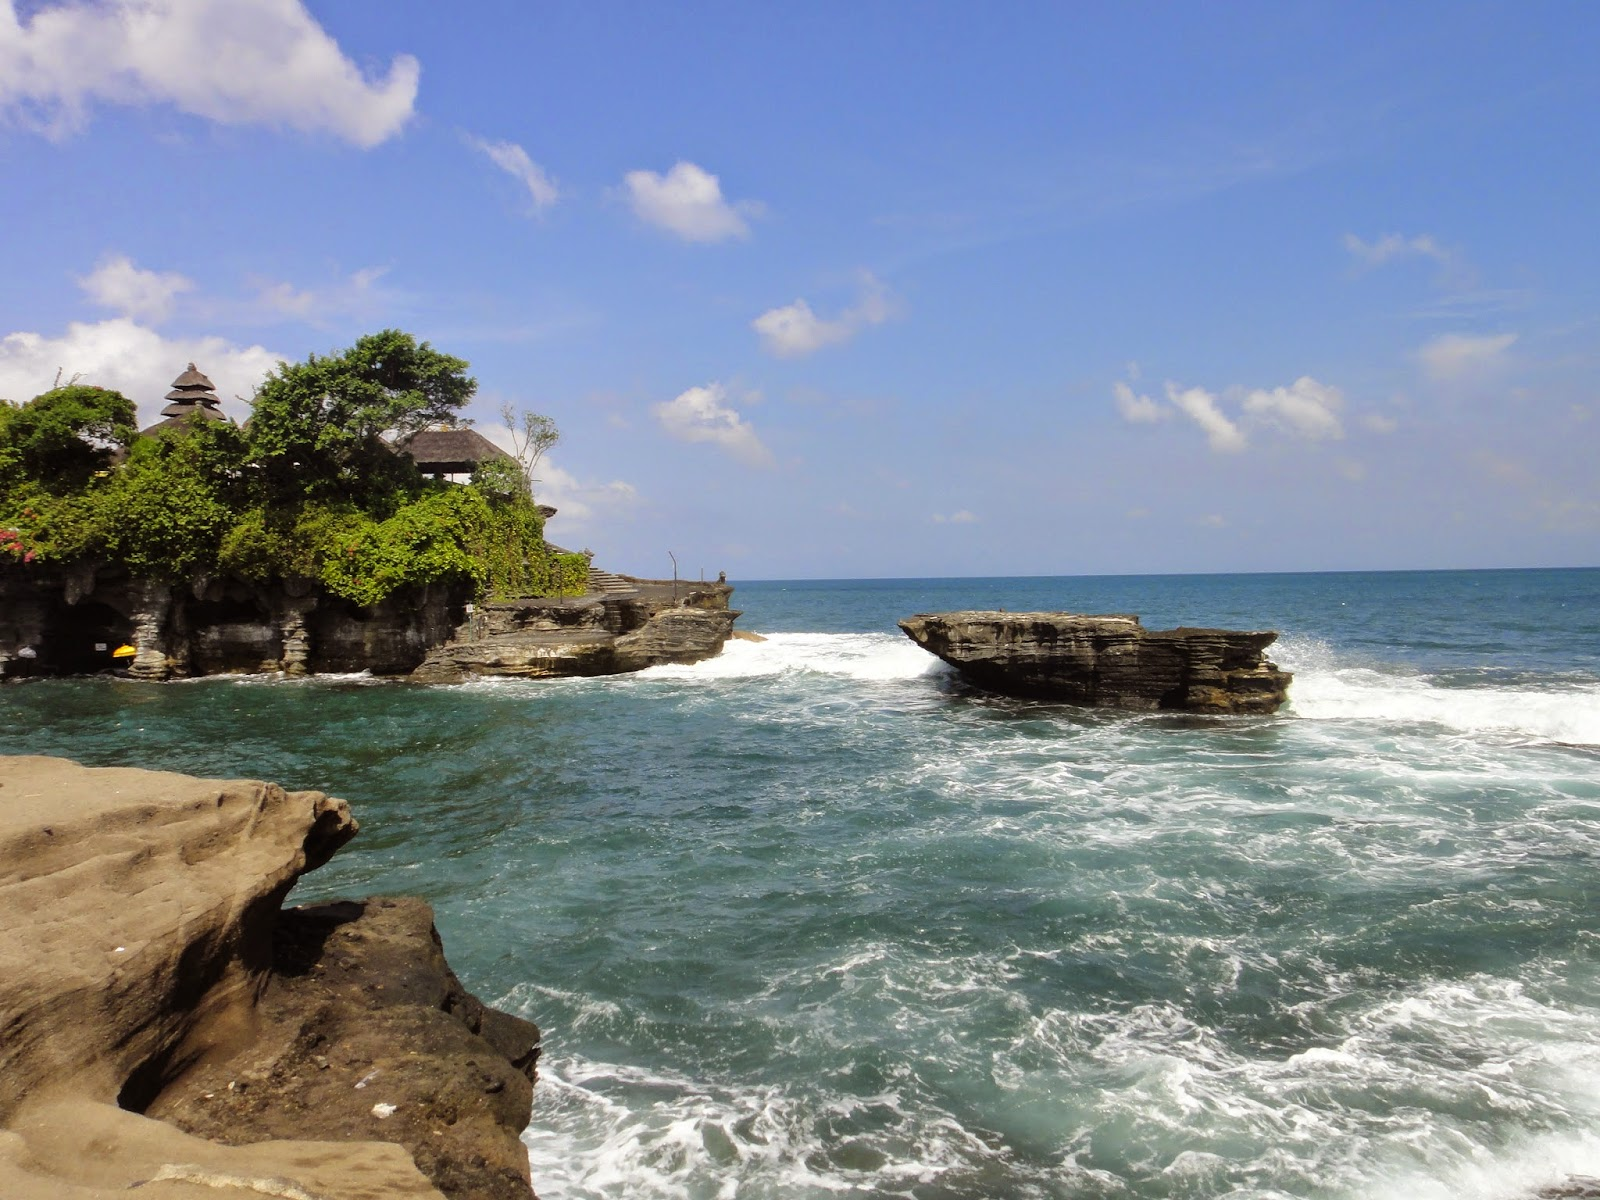 Pura Tanah Lot Bali Island Indonesia